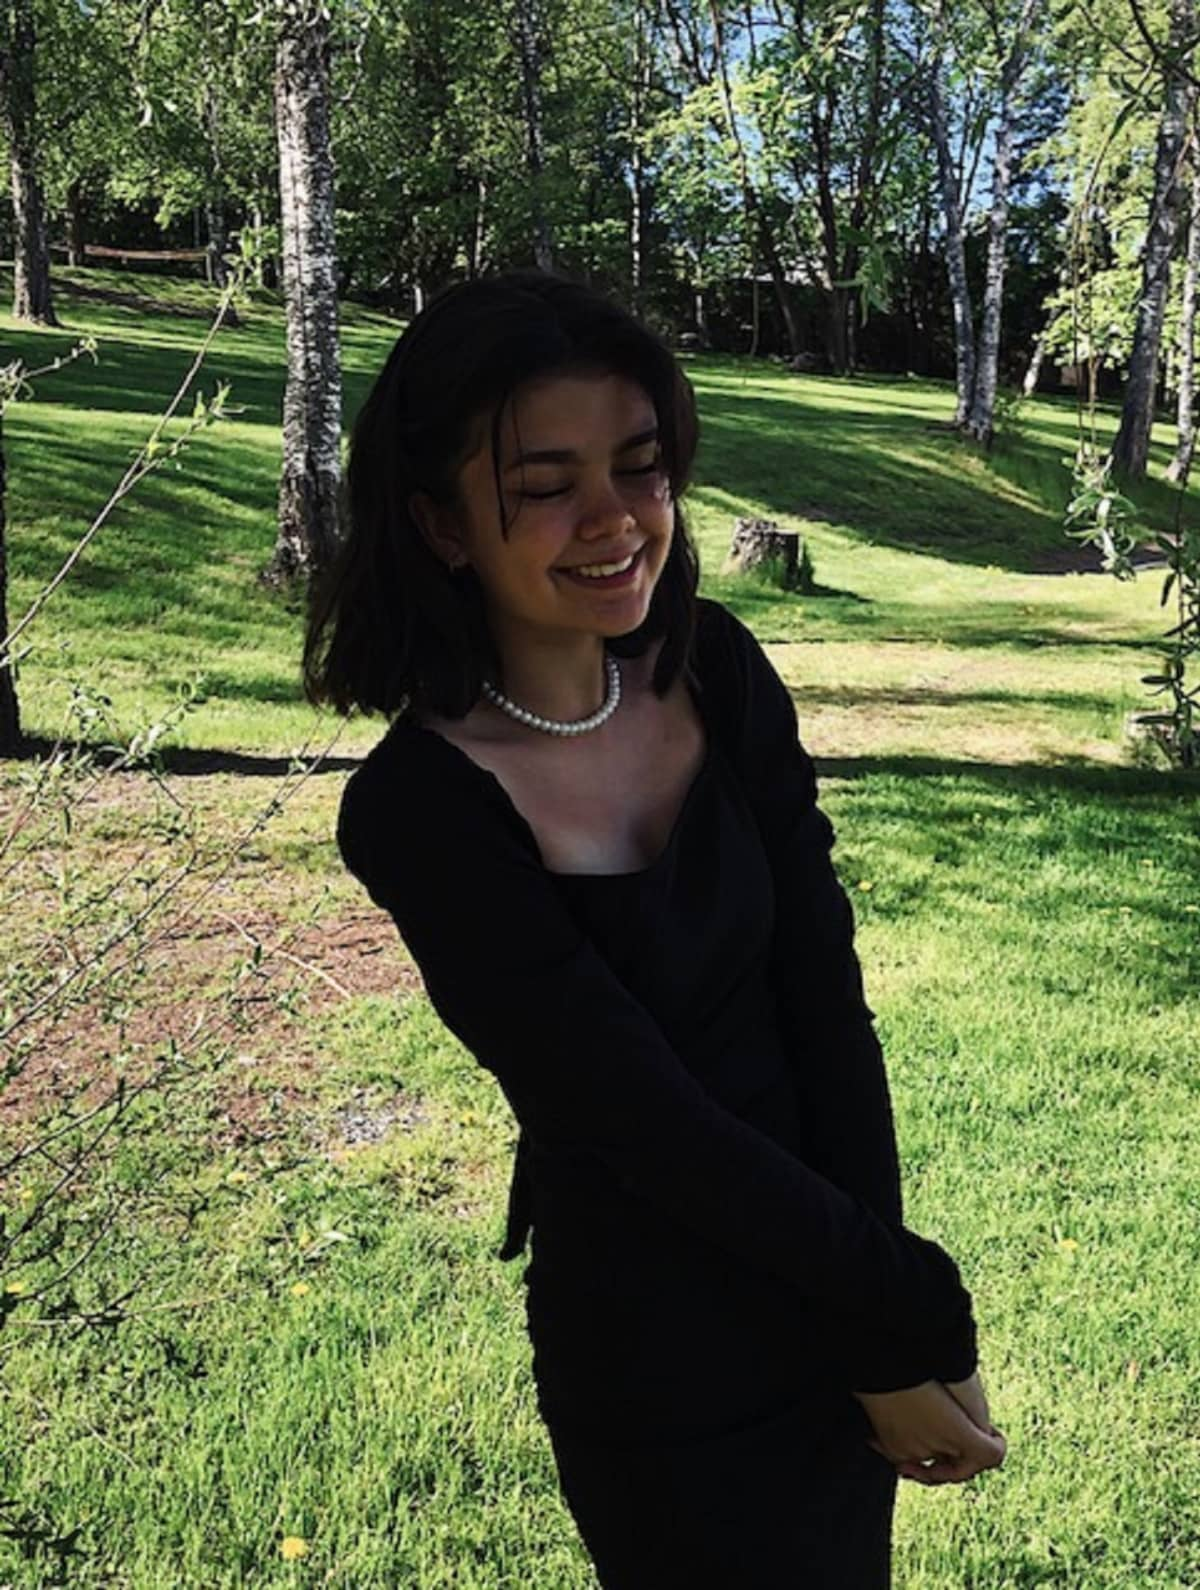 Nathalie Maaniemi